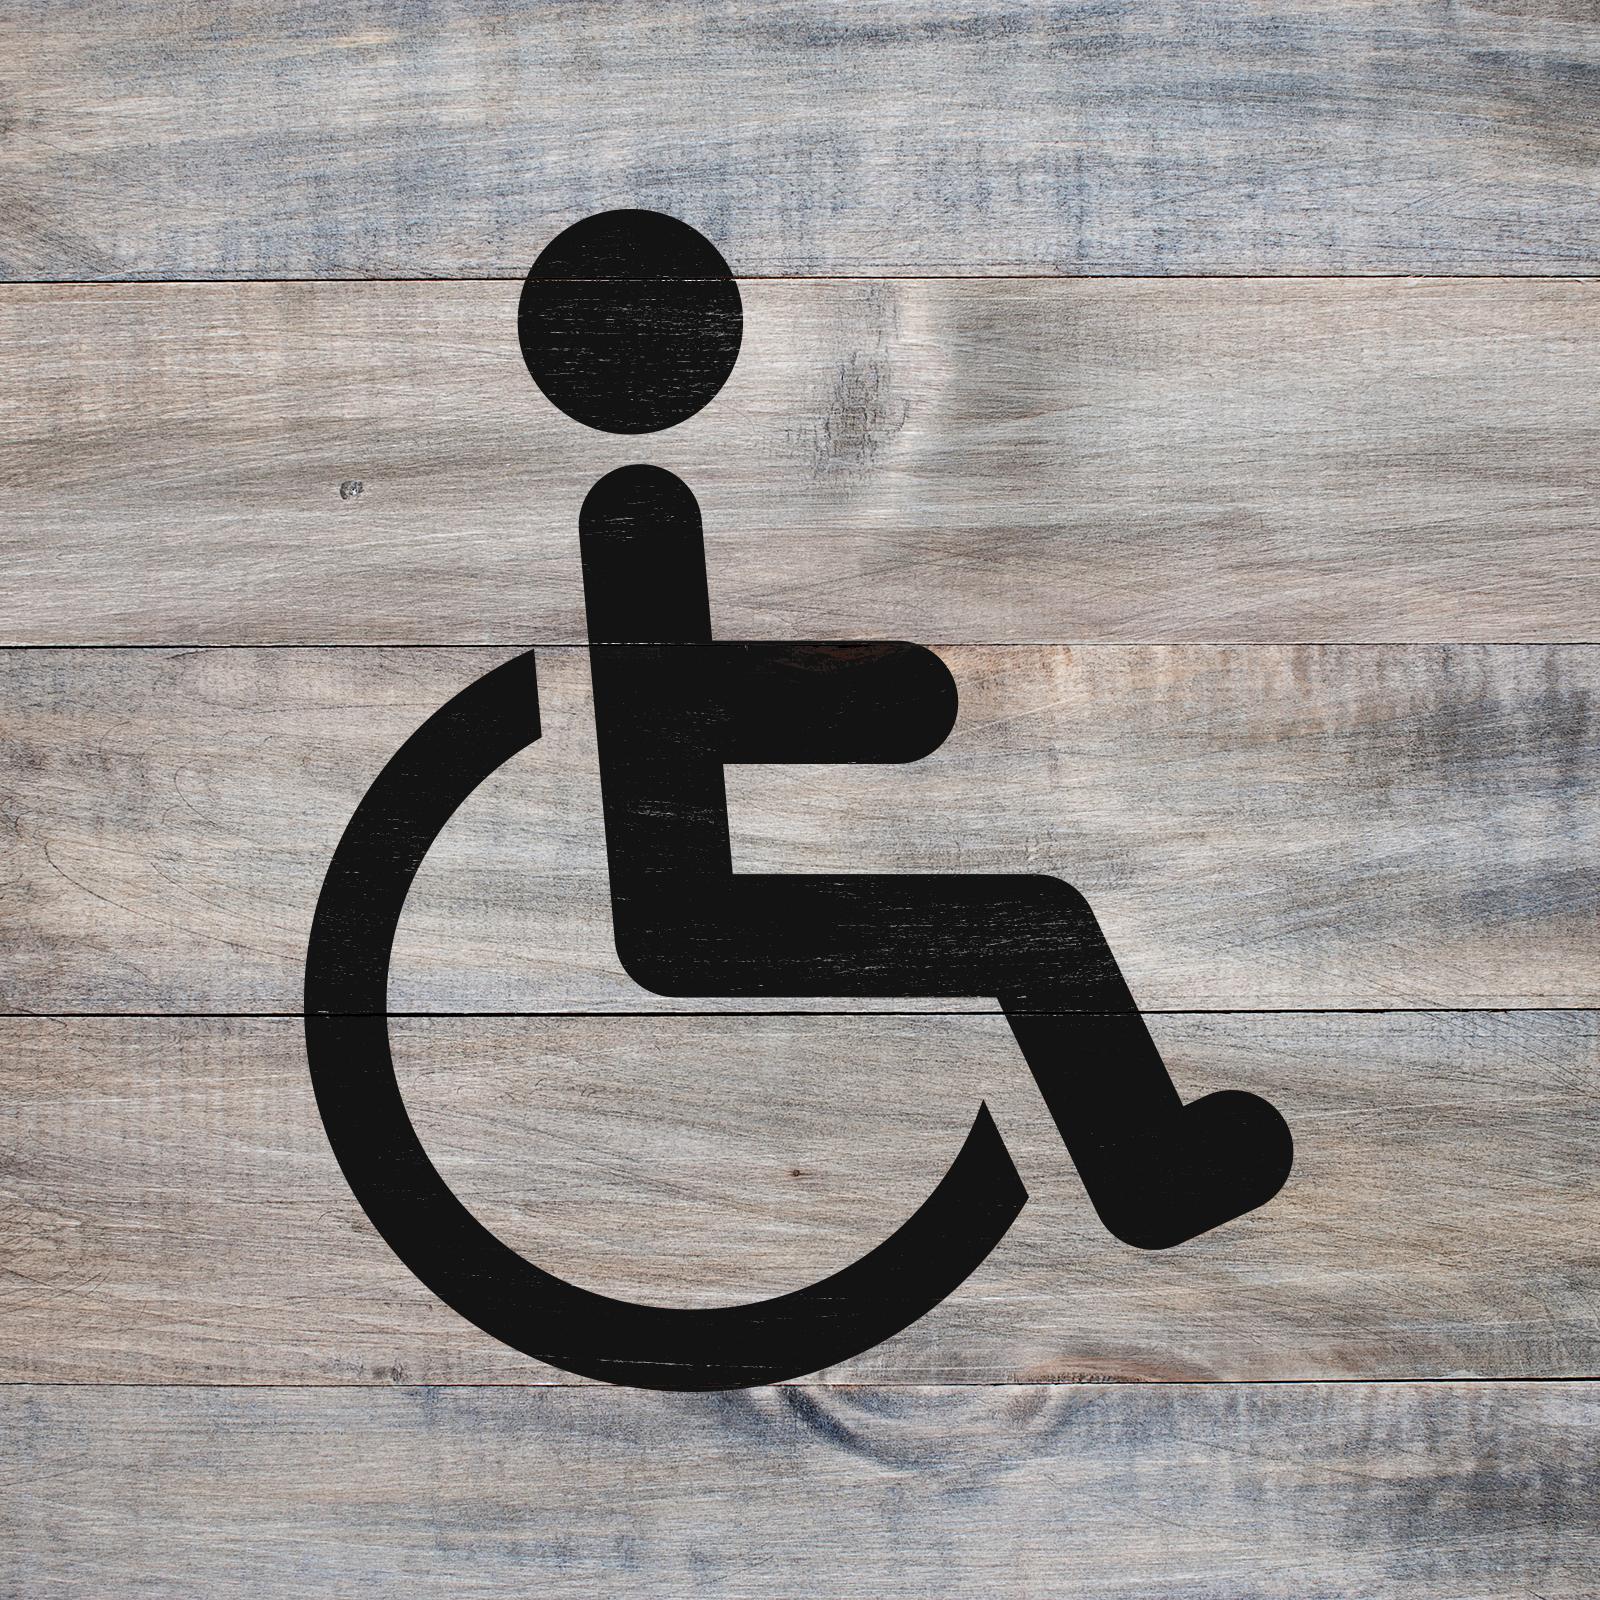 Handicap Symbol Stencil - Reusable Stencils of Handicap Sign in Multiple Sizes